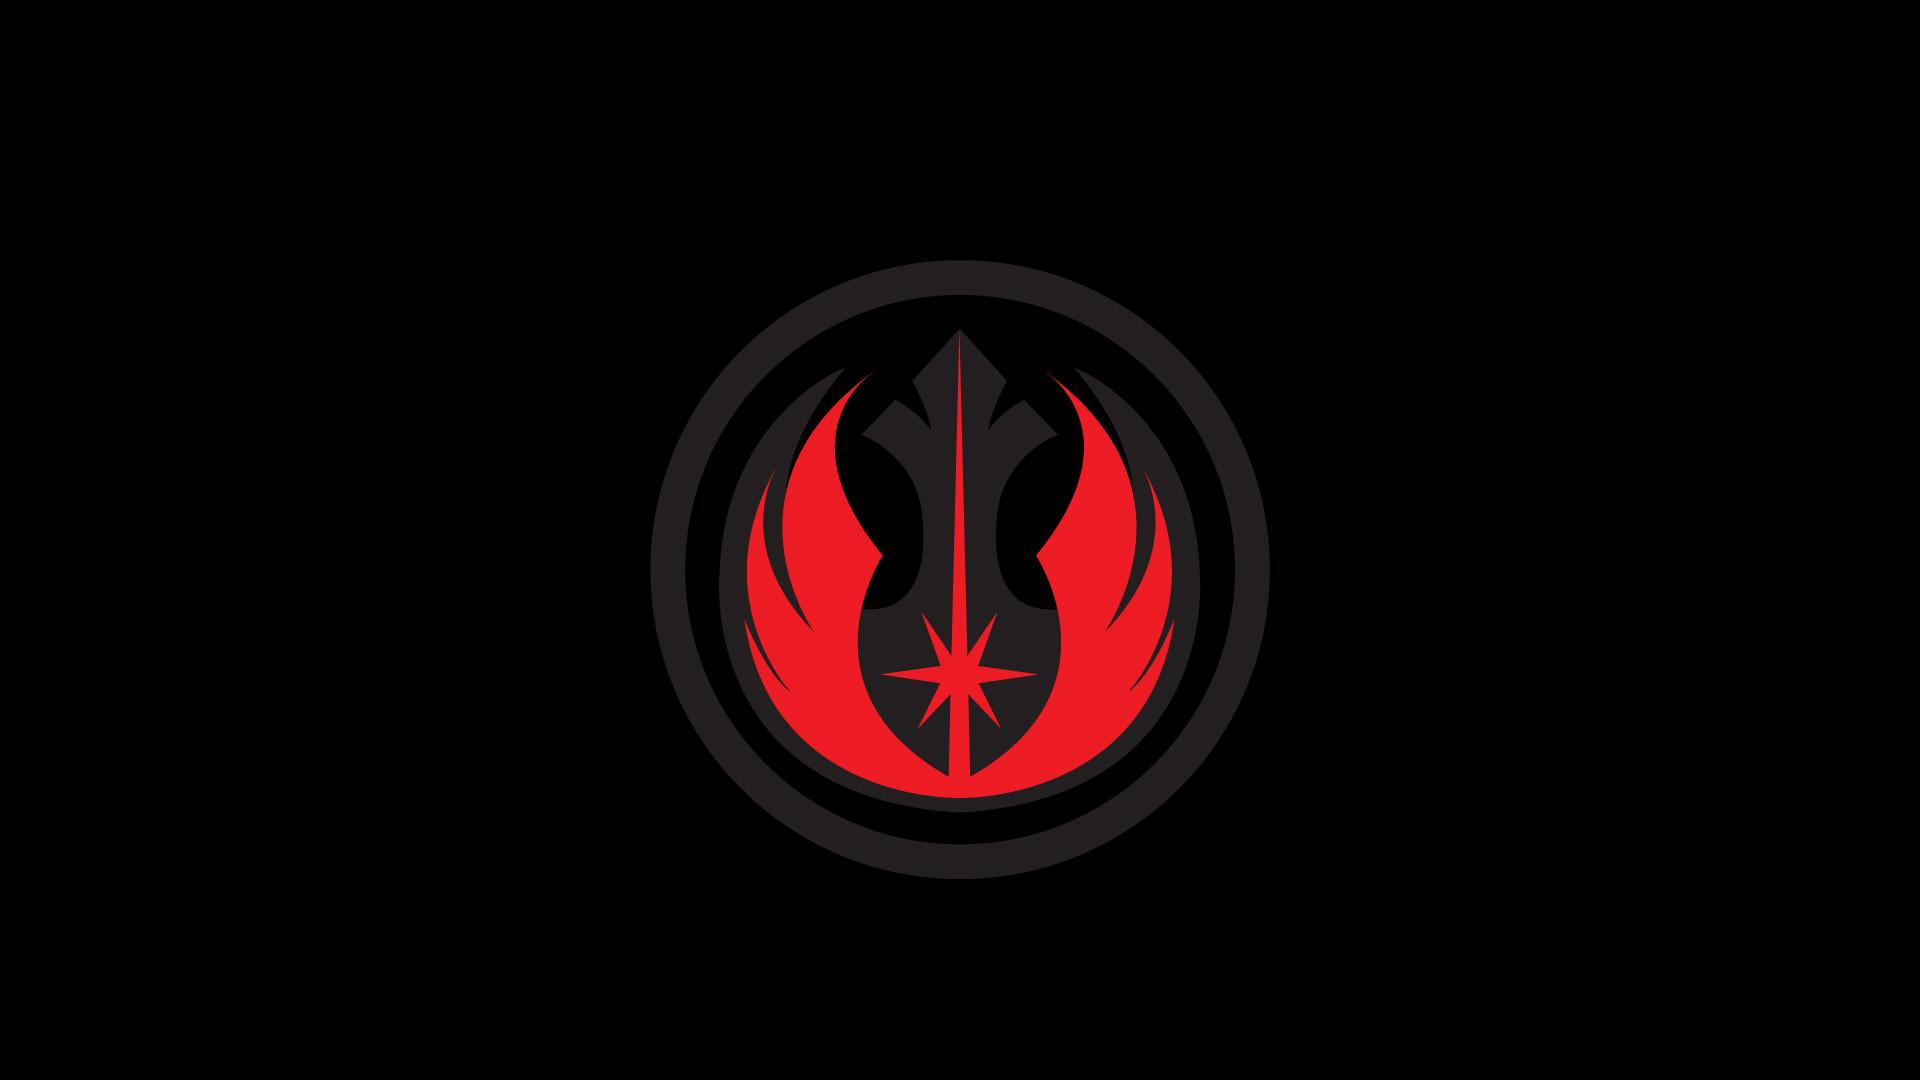 Wallpaper of my friends favourite Star Wars logos.